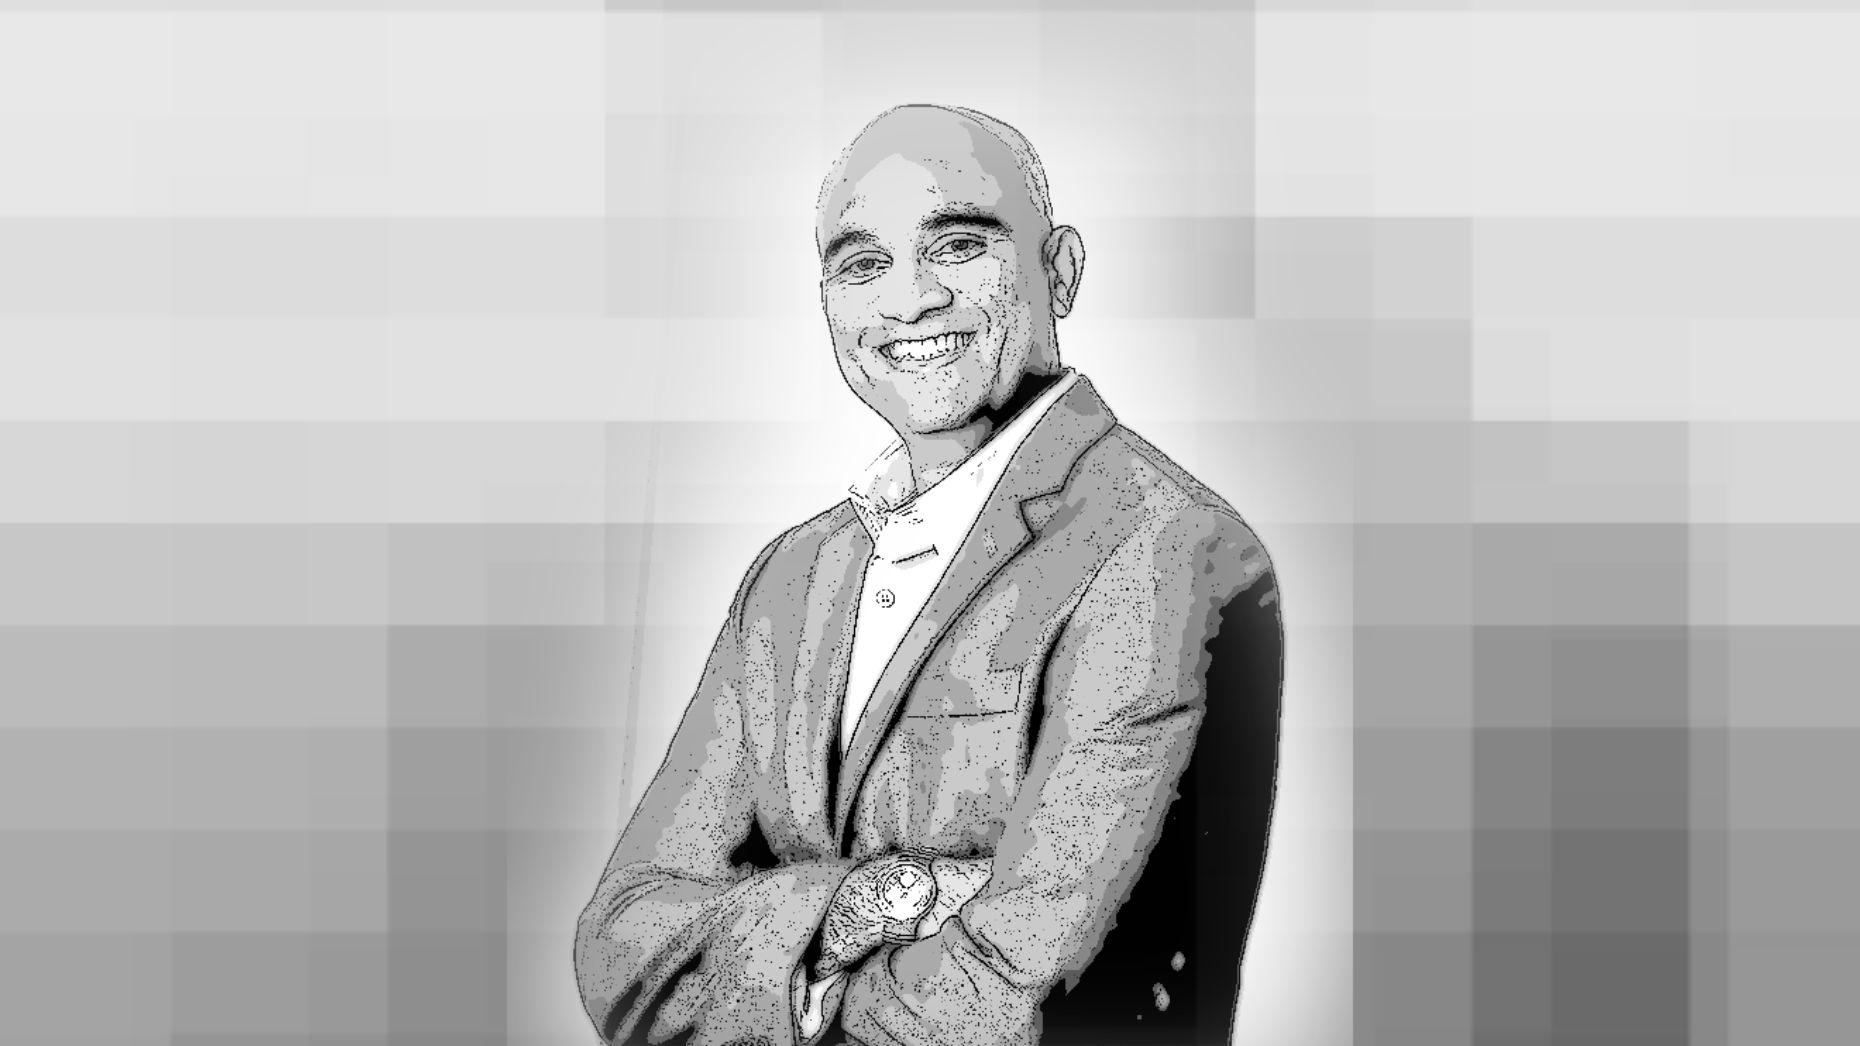 Himagiri Mukkamala, GE's Head of Engineering for Predix. Art by Matt Vascellaro.